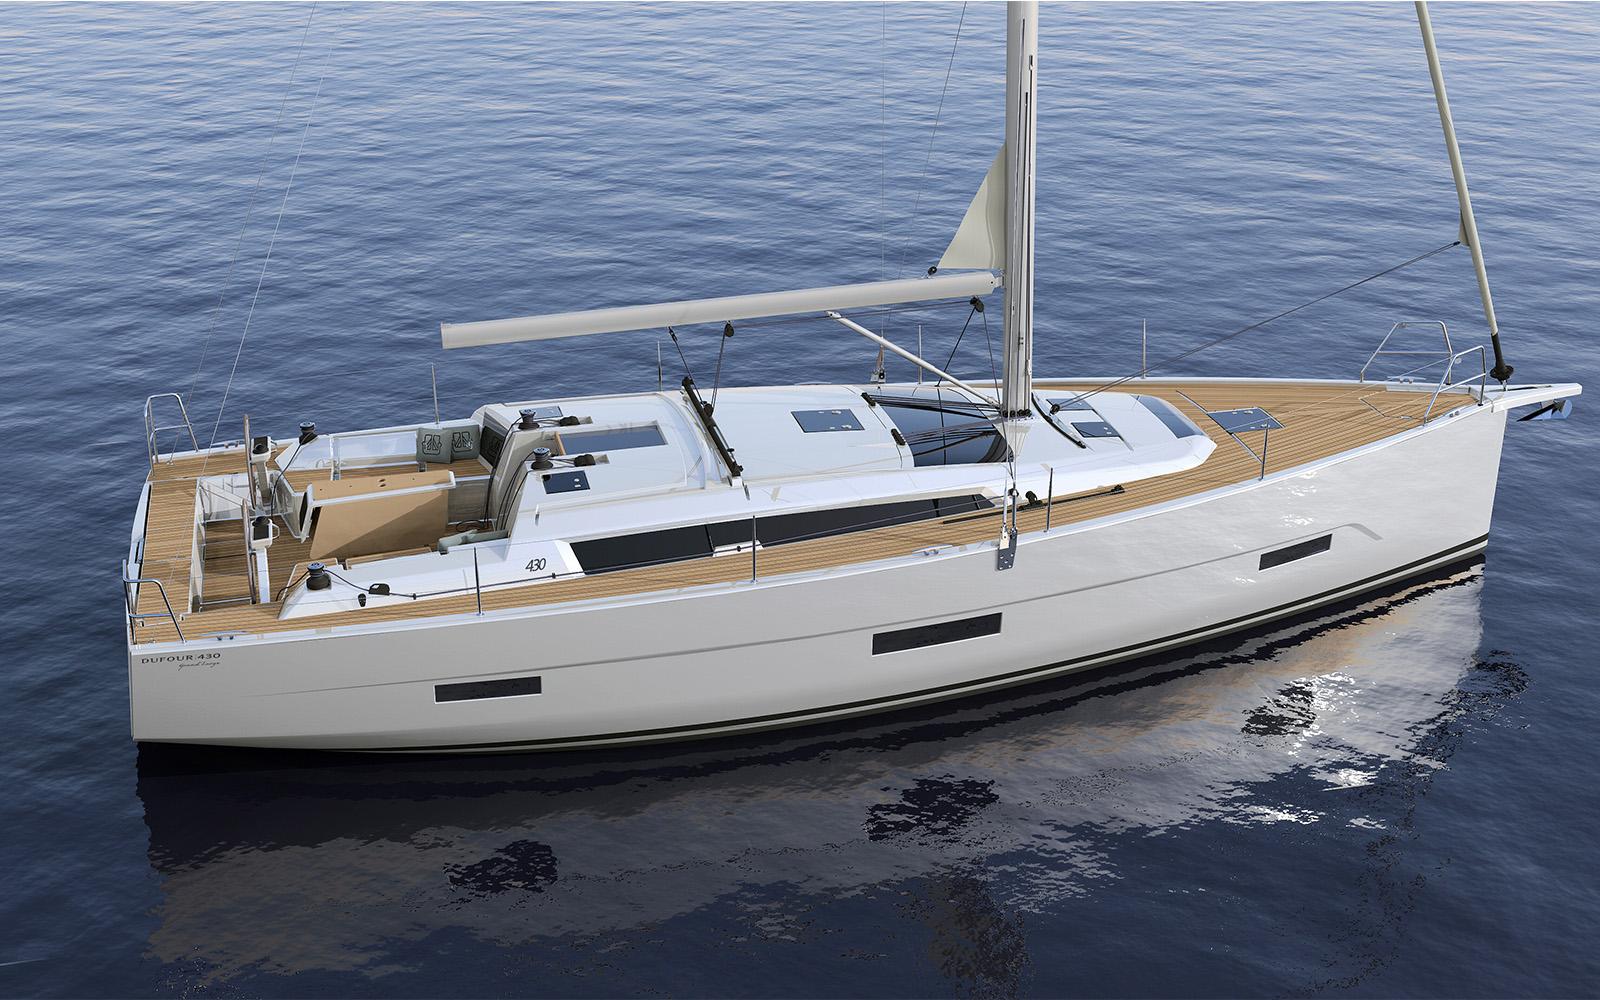 Modelo 1 - Boat Shopping